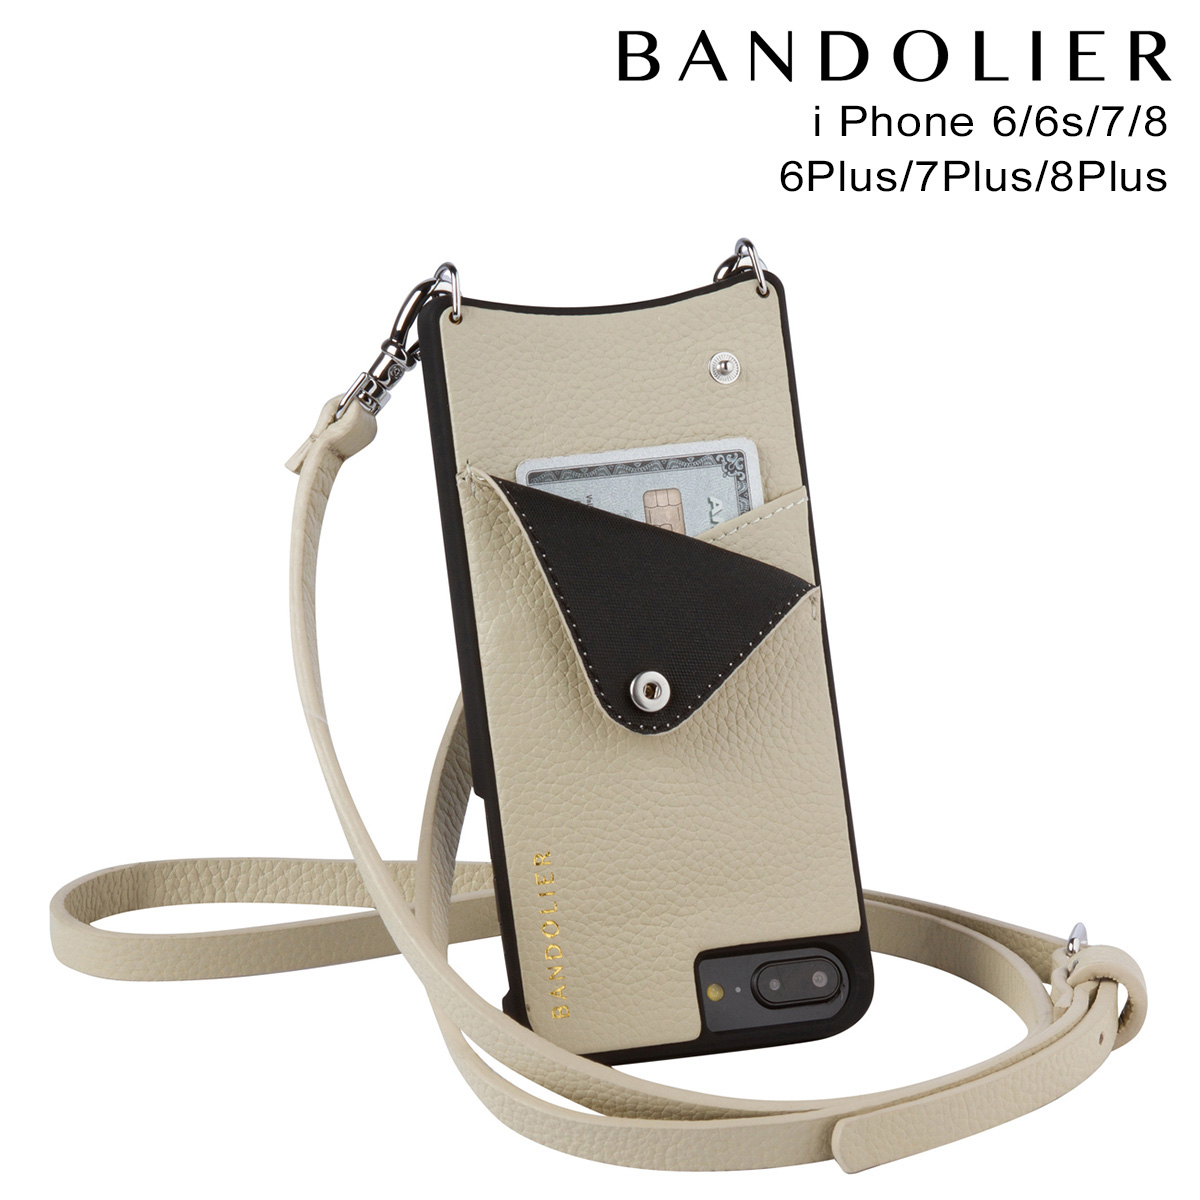 BANDOLIER EMMA IVORY バンドリヤー iPhone8 iPhone7 7Plus 6s ケース スマホ アイフォン プラス メンズ レディース [7/26 新入荷]